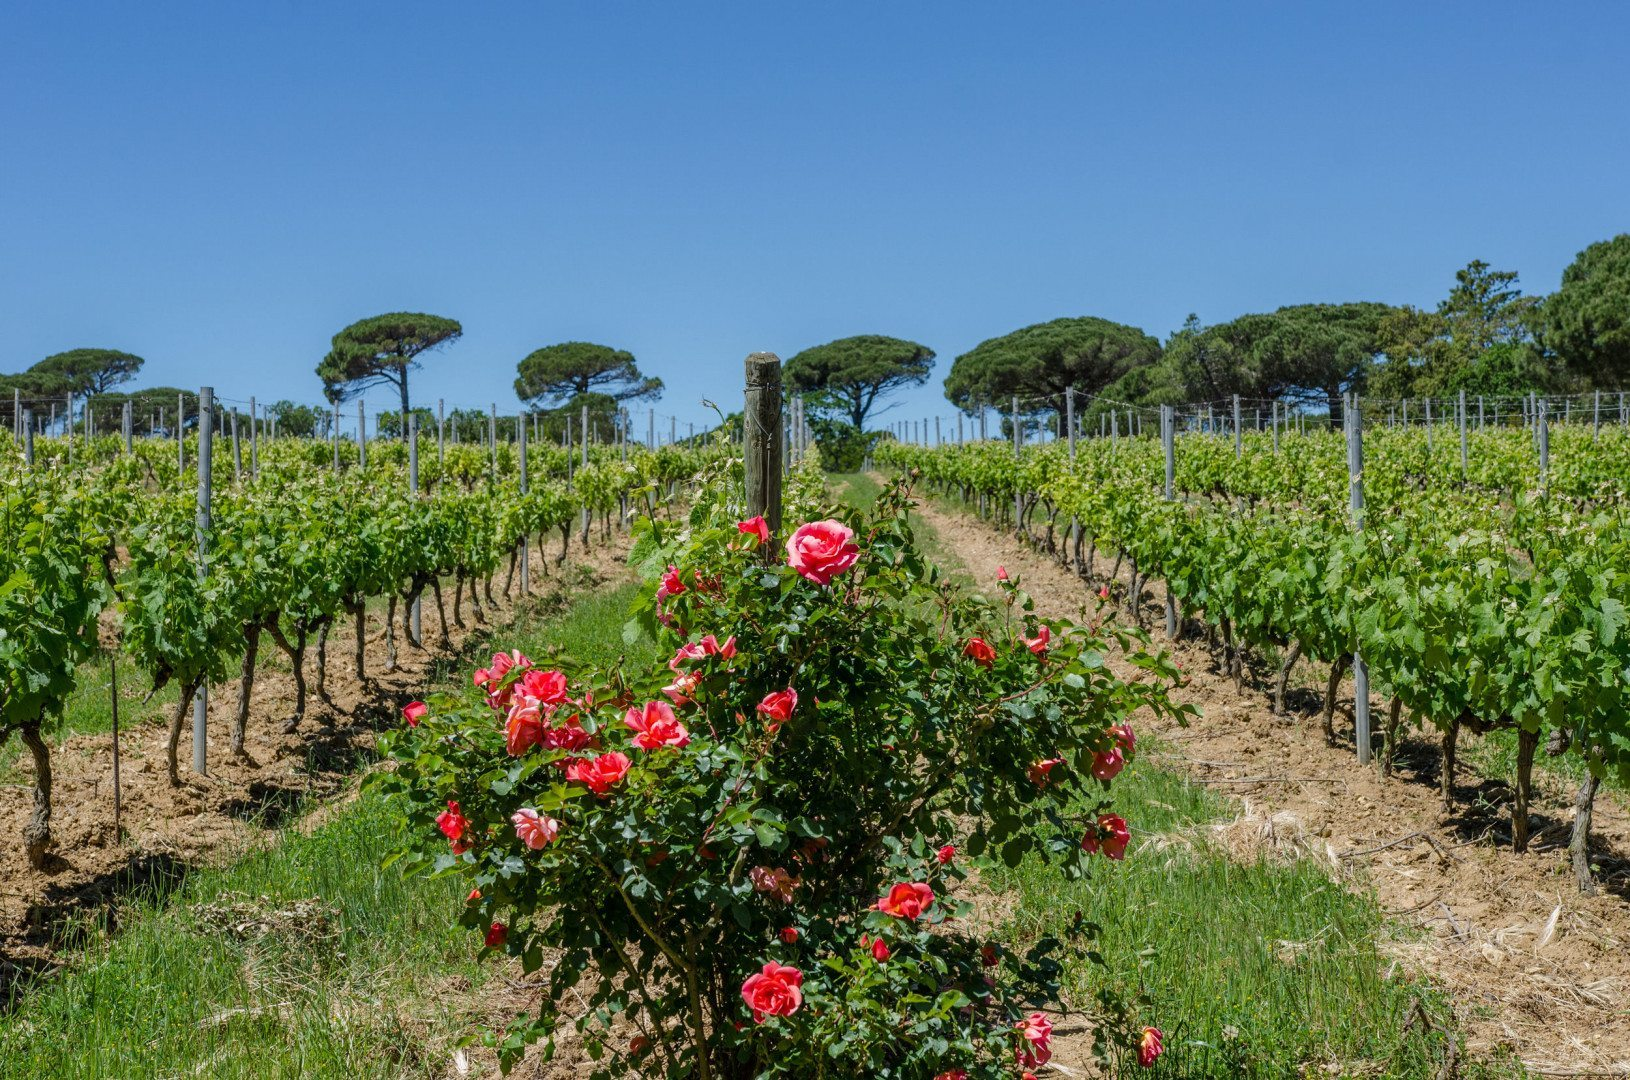 chateau-volterra-vineyard-ramatuelle-st-tropez